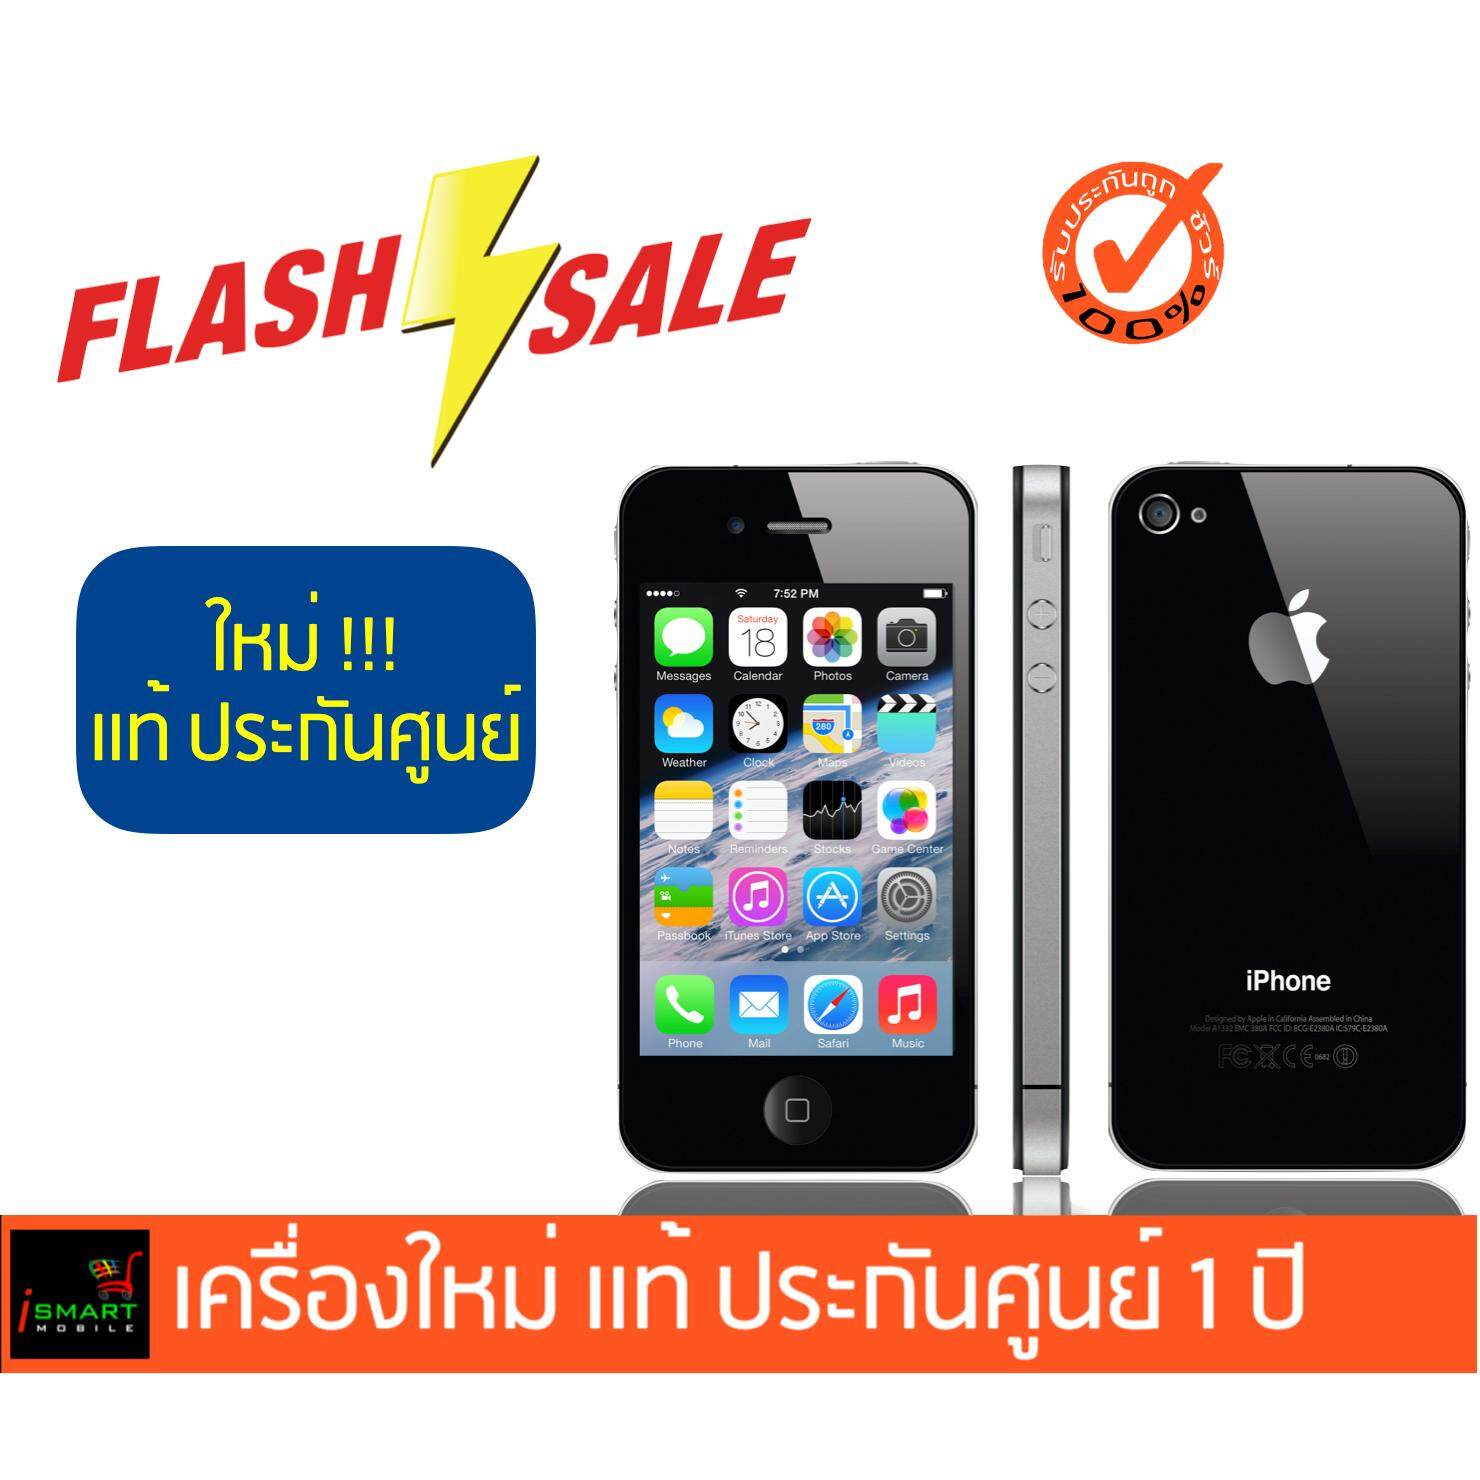 Apple iPhone 4 8GB  ลดเหลือ 3,390.- เครื่องแท้ศูนย์ กดโค๊ตเลย ismart10 ผ่านแอป